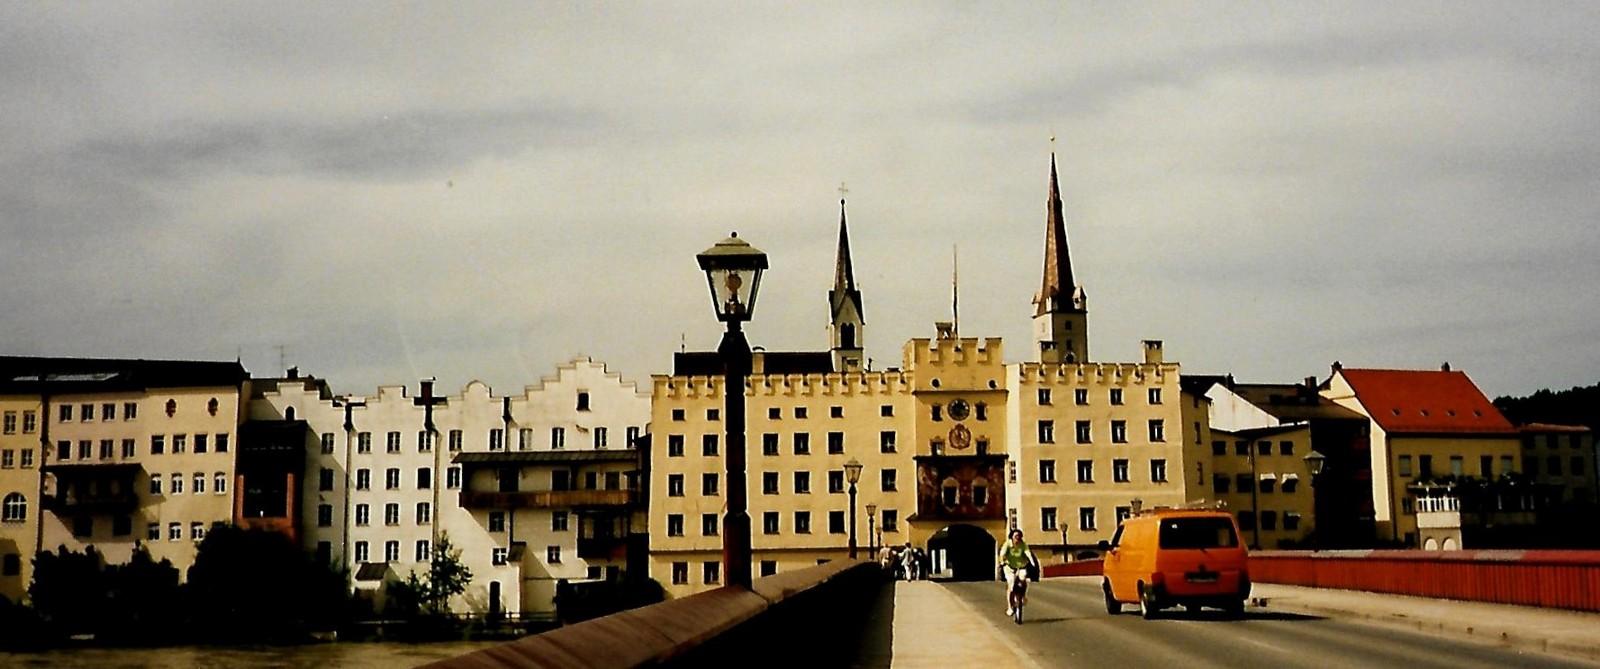 Rote Brücke in Wasserburg am Inn